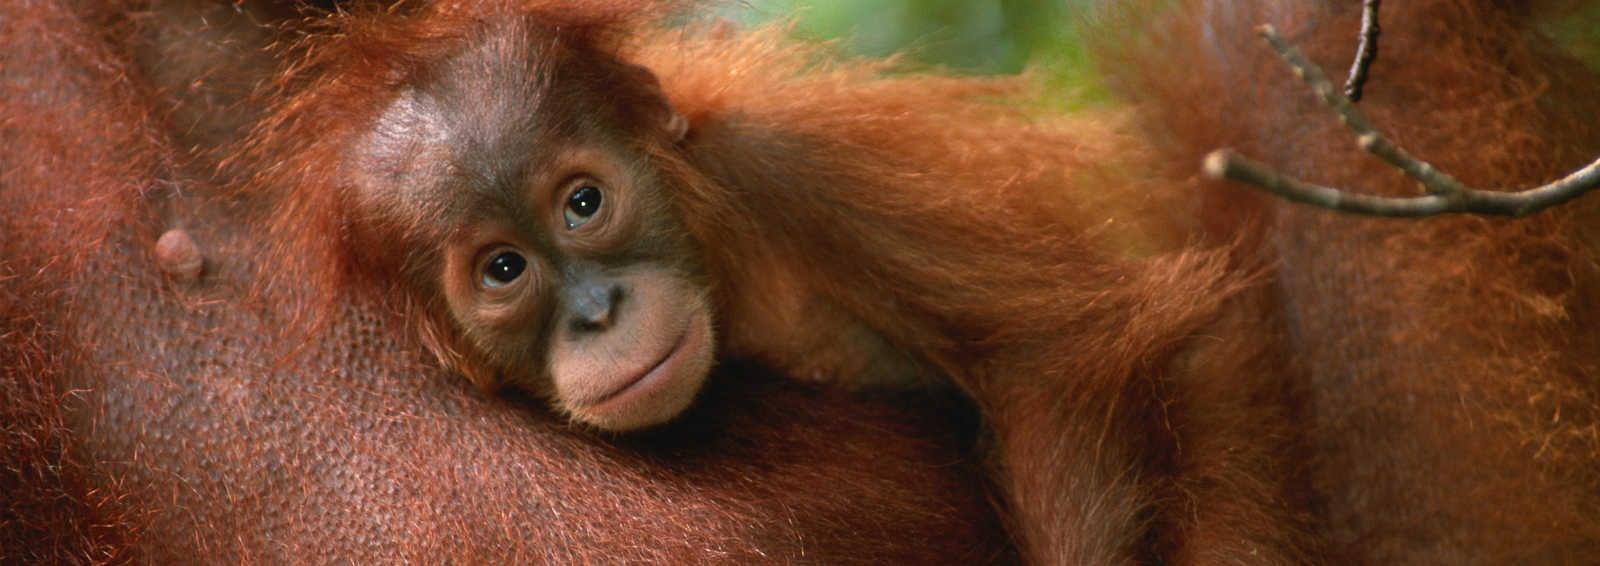 Baby orang utan (Pongo pygmaeus) resting on it's mother's chest, close up, Gunung Leuser N.P, Indonesia